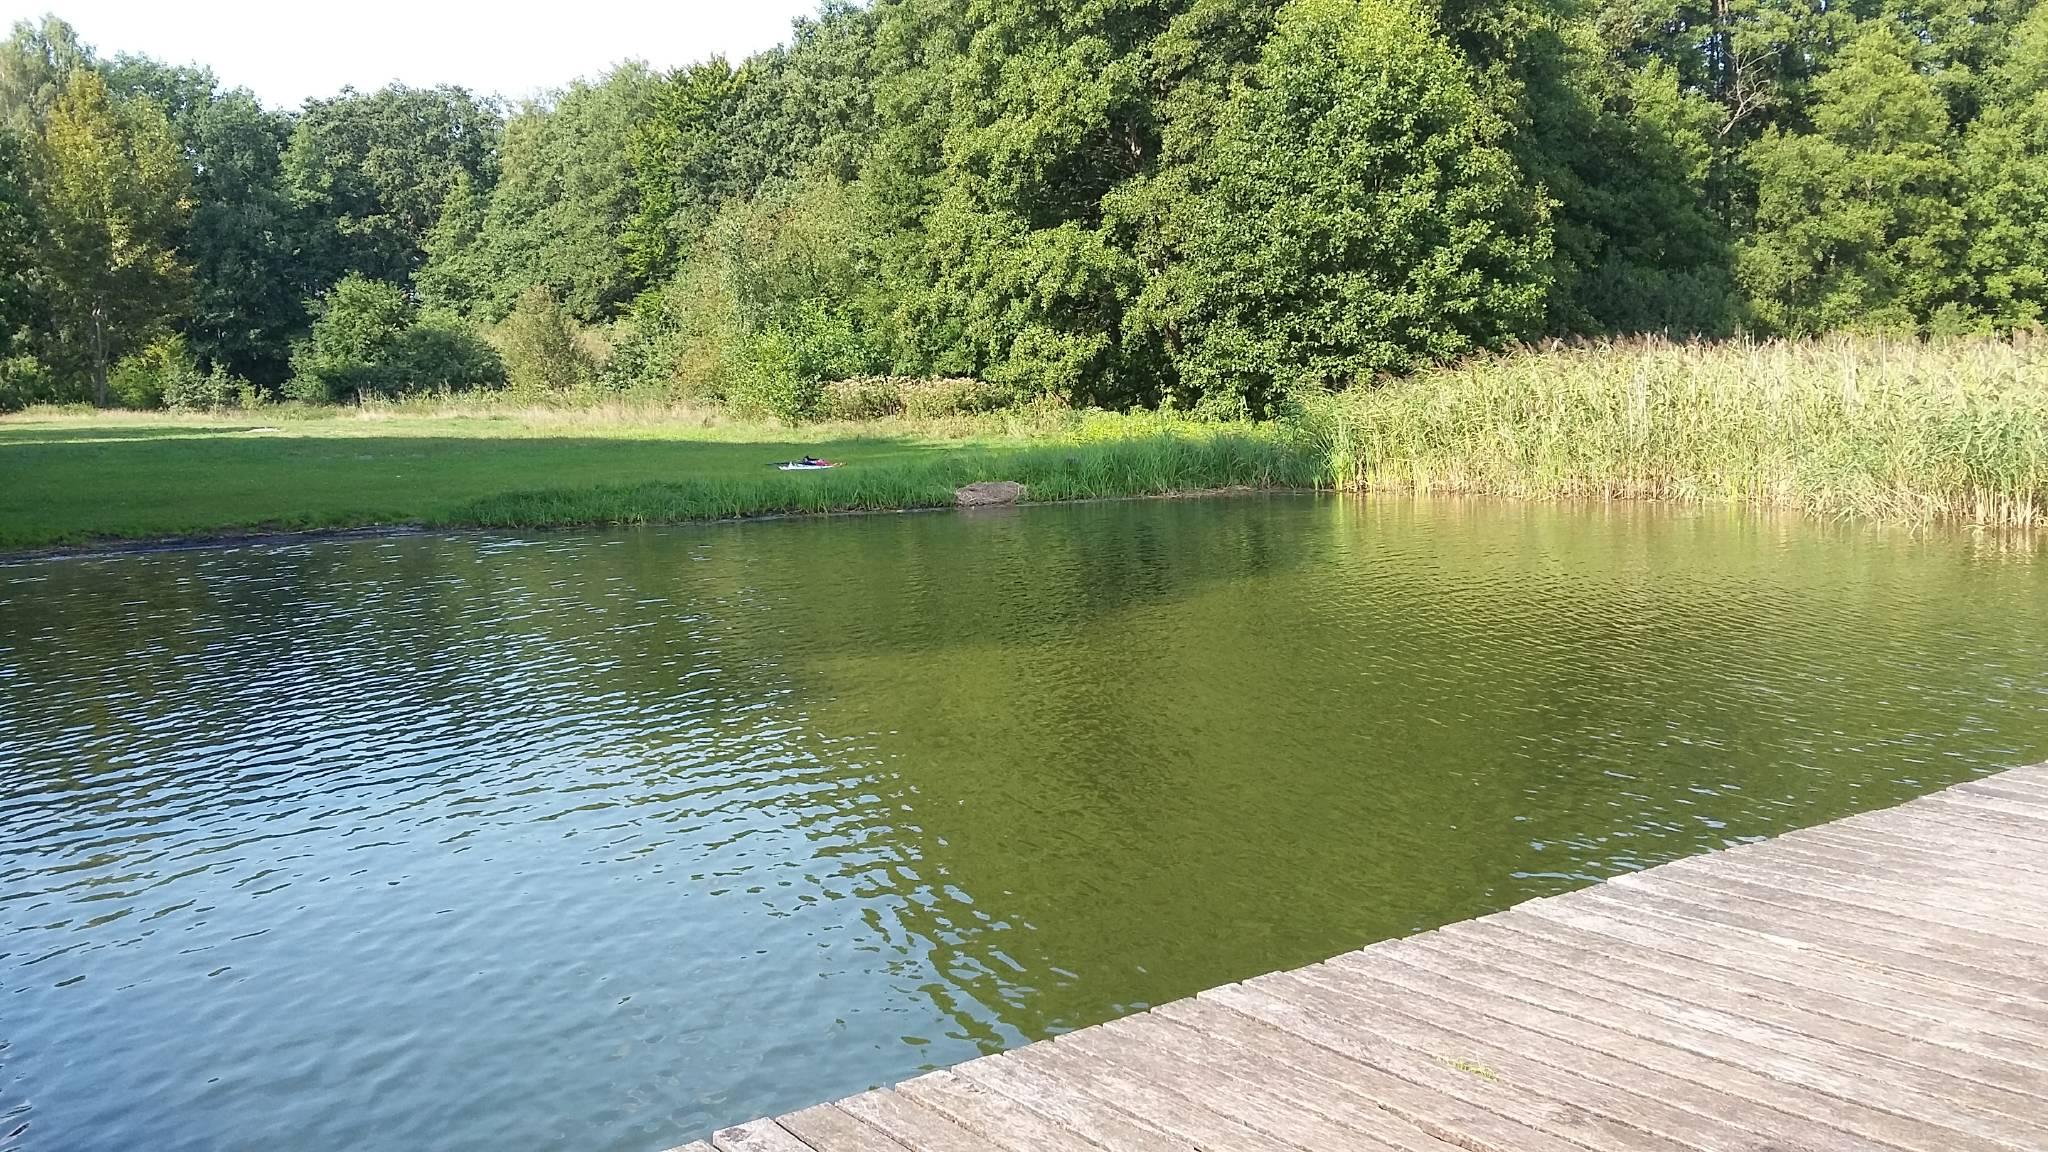 Kiever Badestrand am Glambecksee